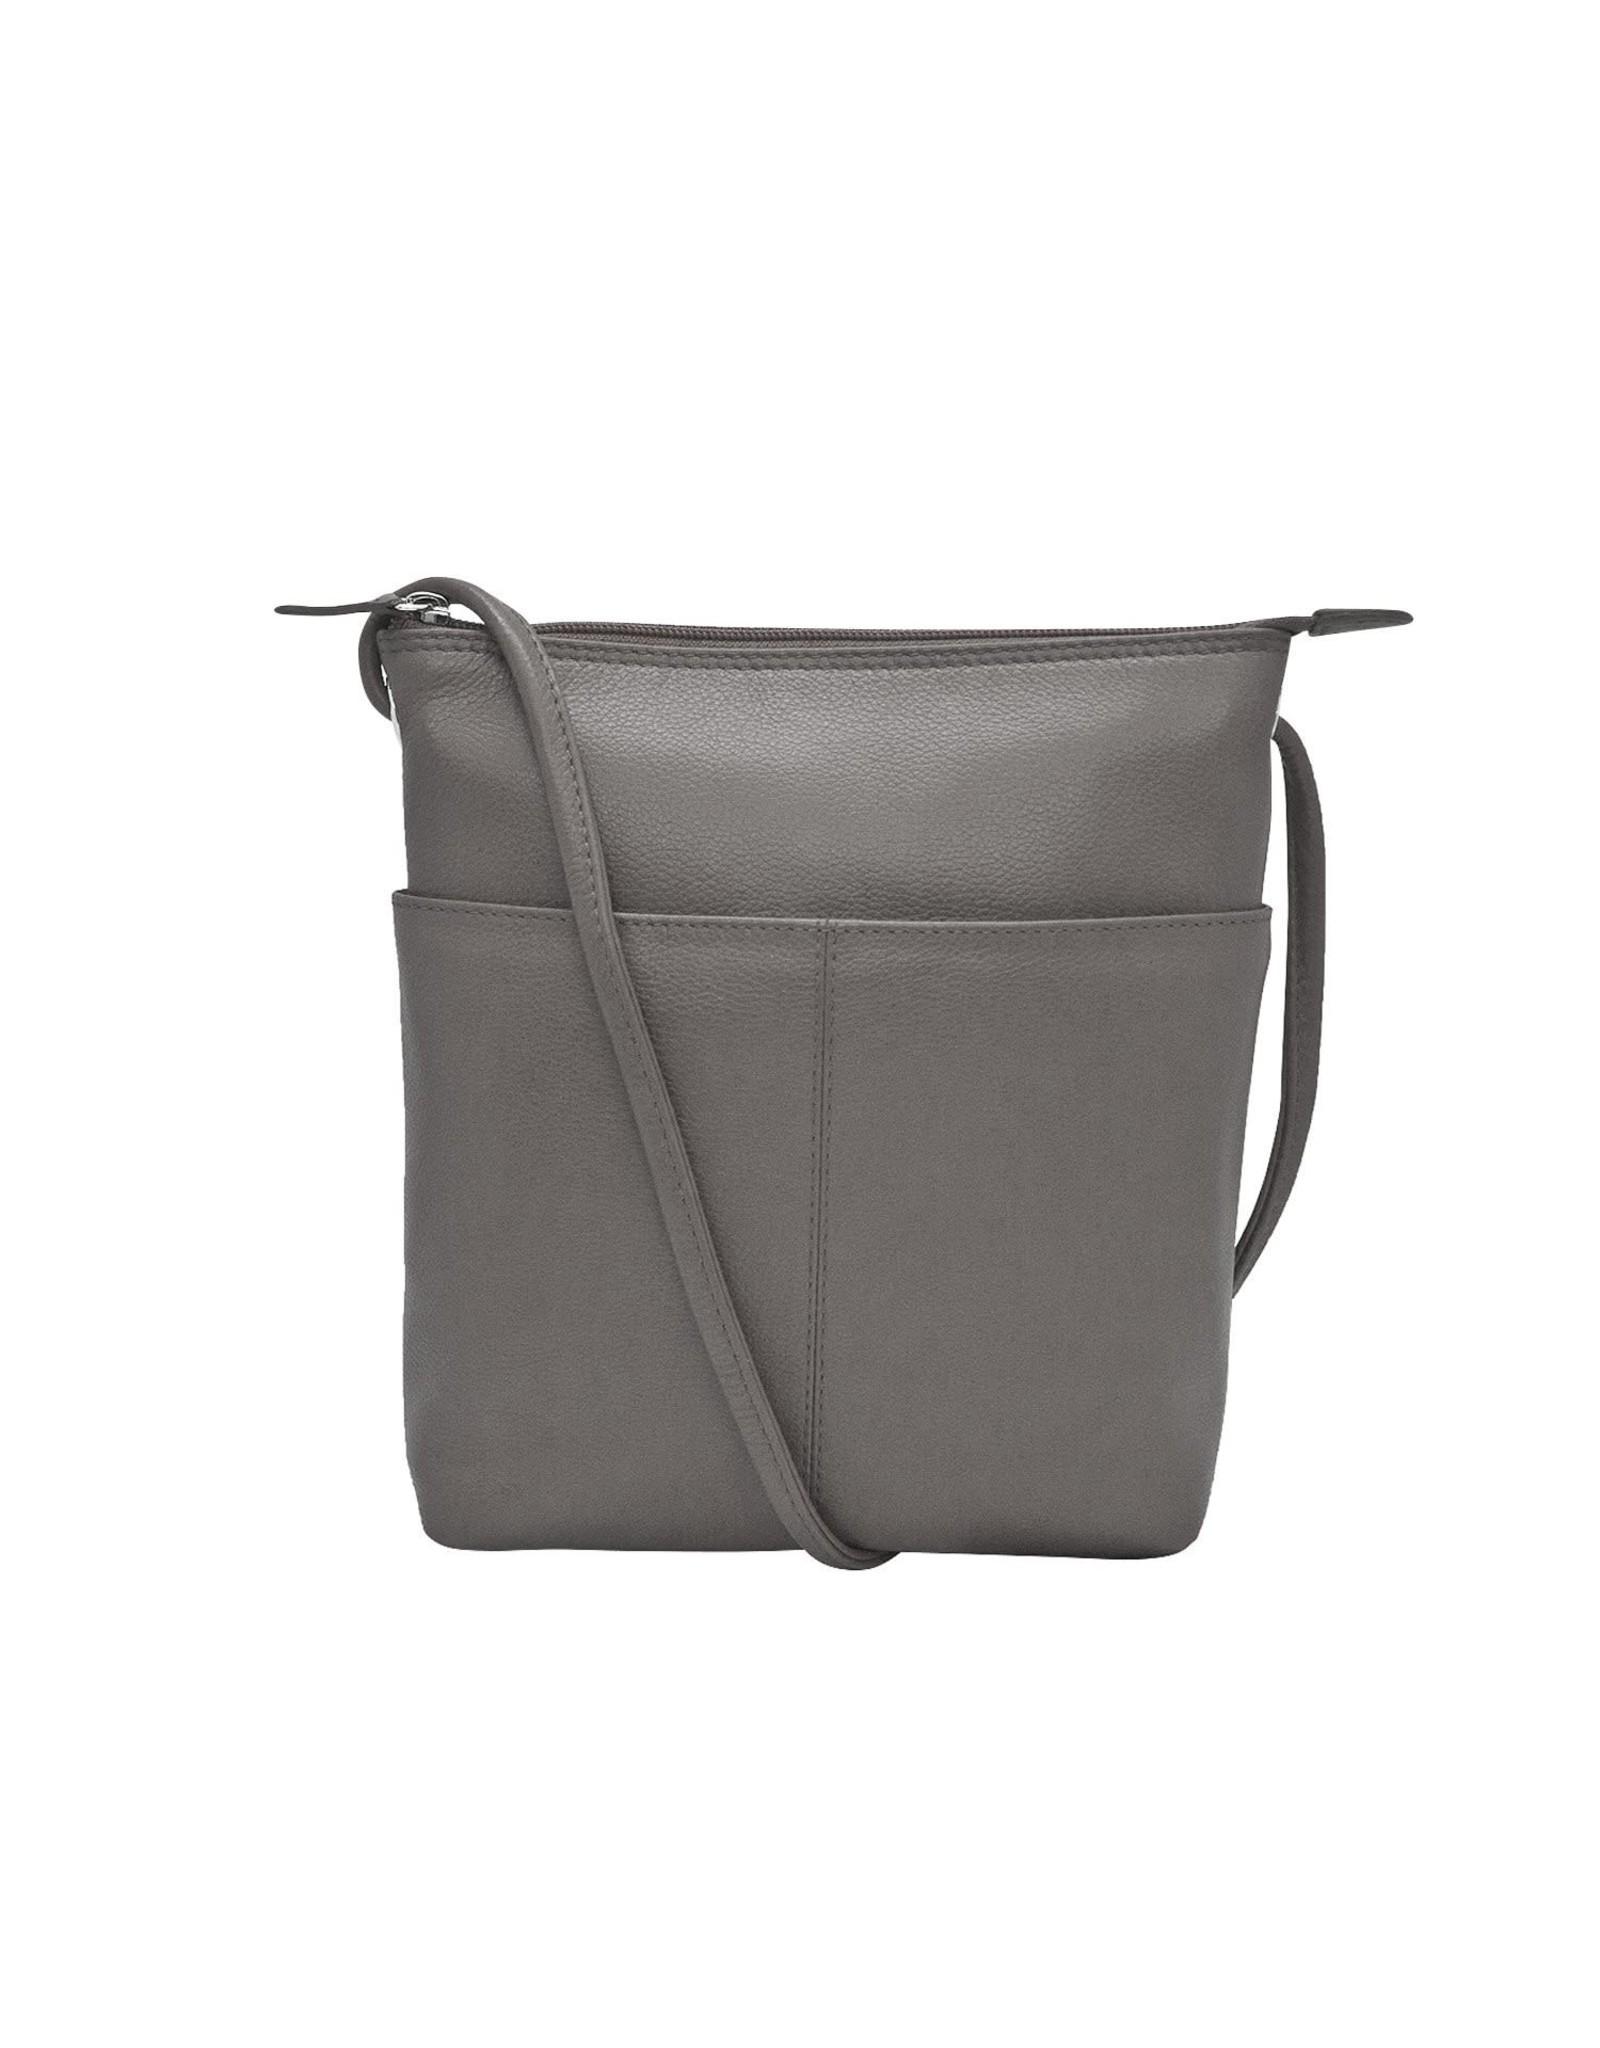 Leather Handbags and Accessories 6661 Gray - Midi Sac